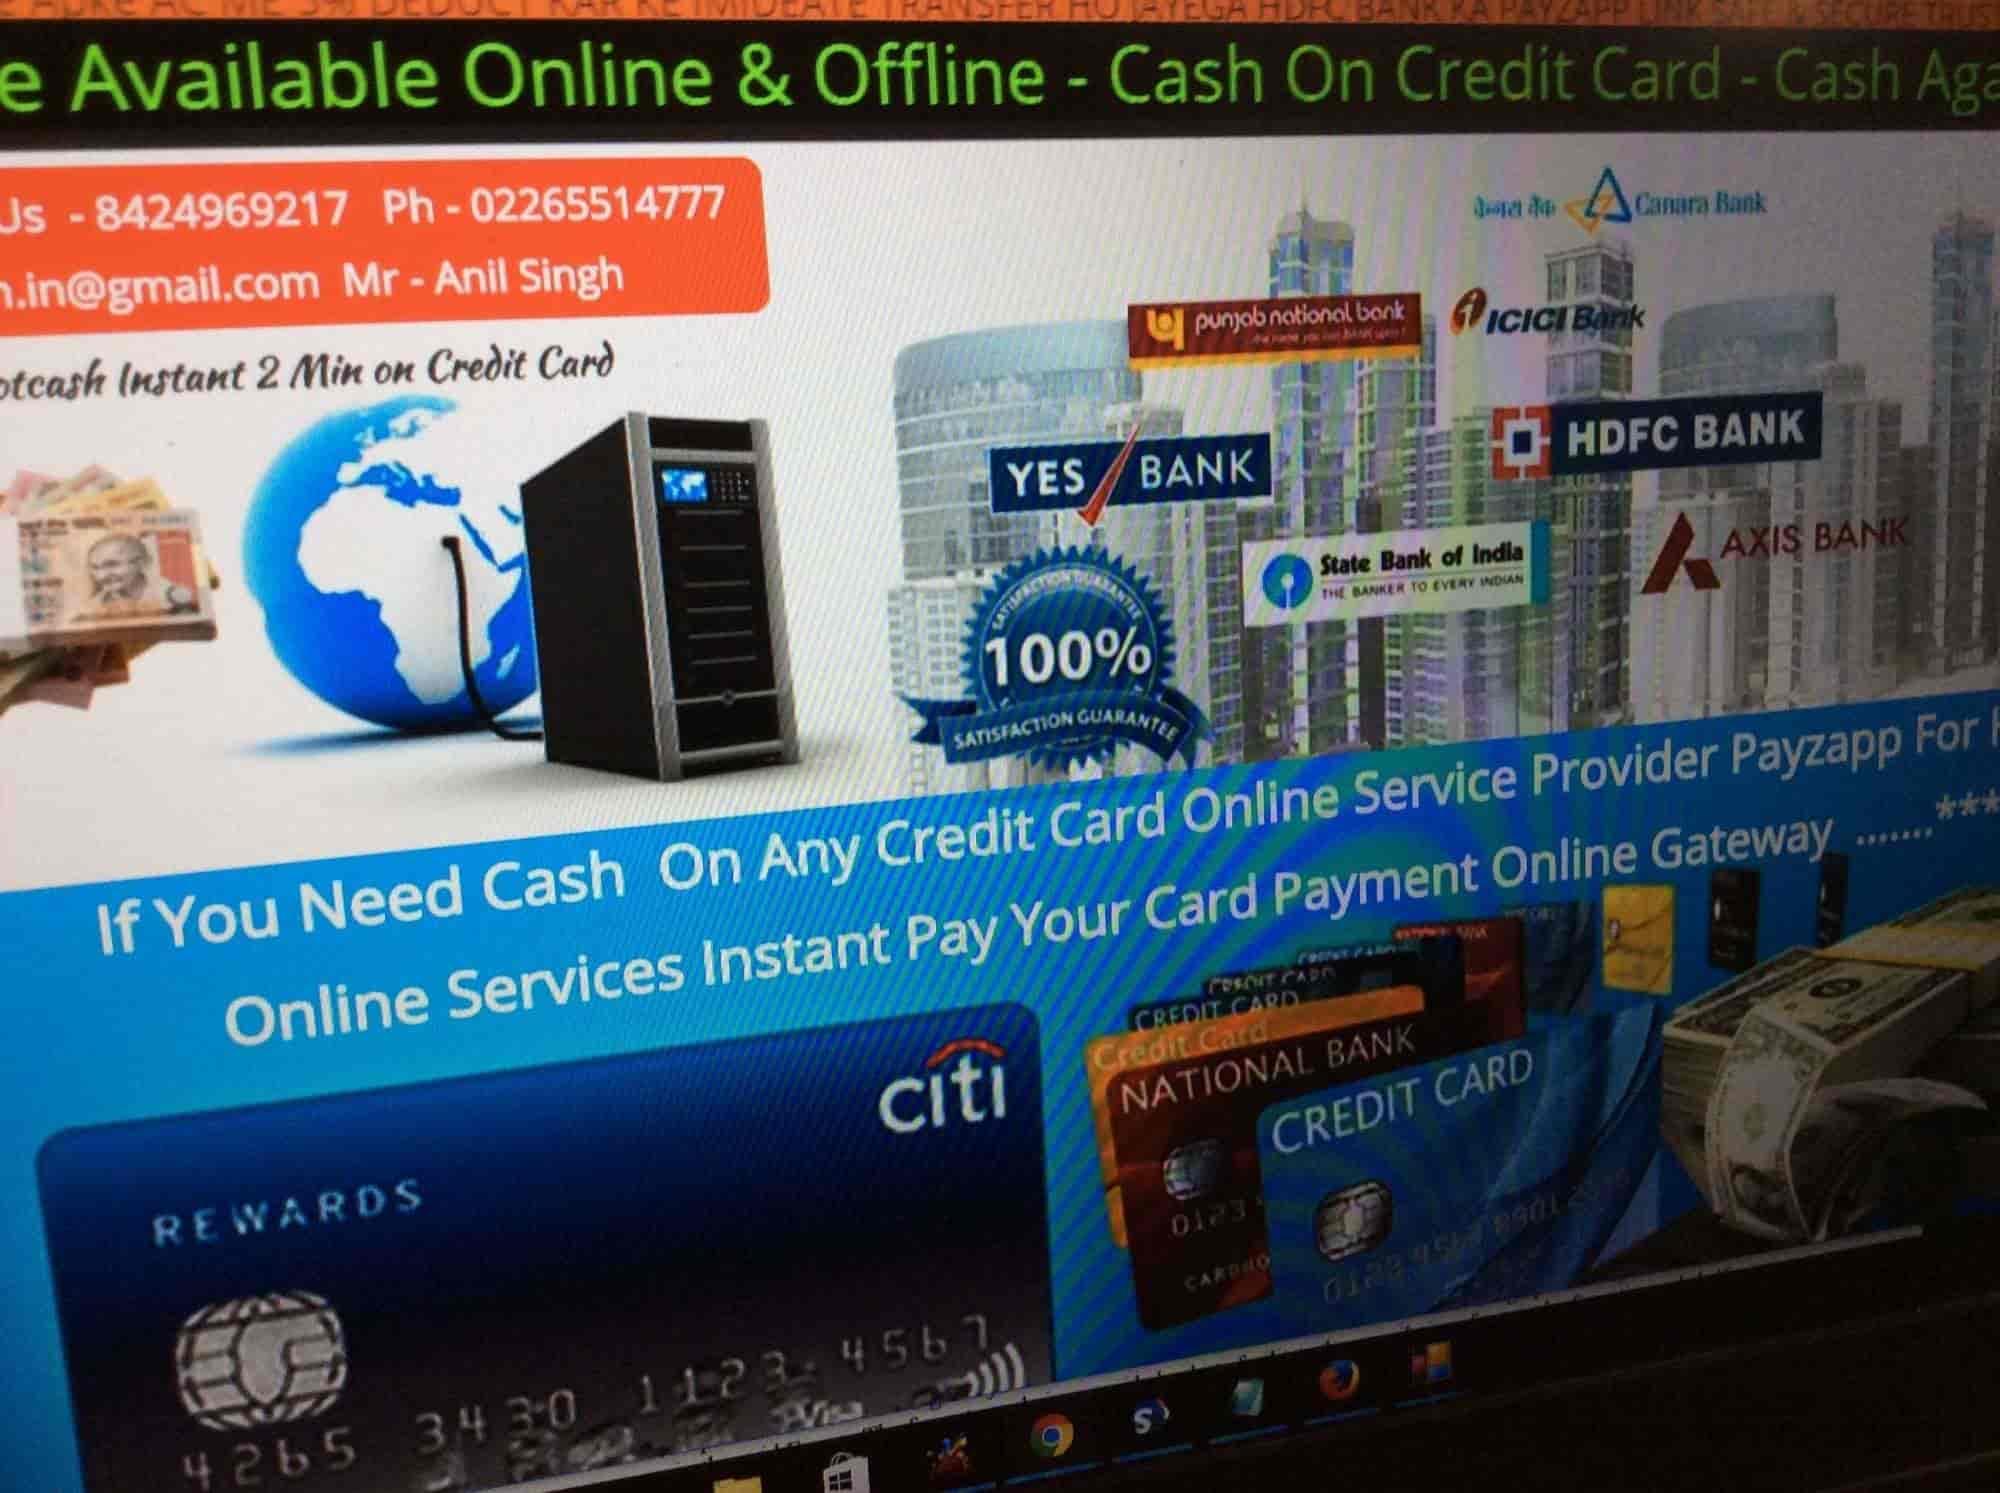 Us bank cash advance charge image 9